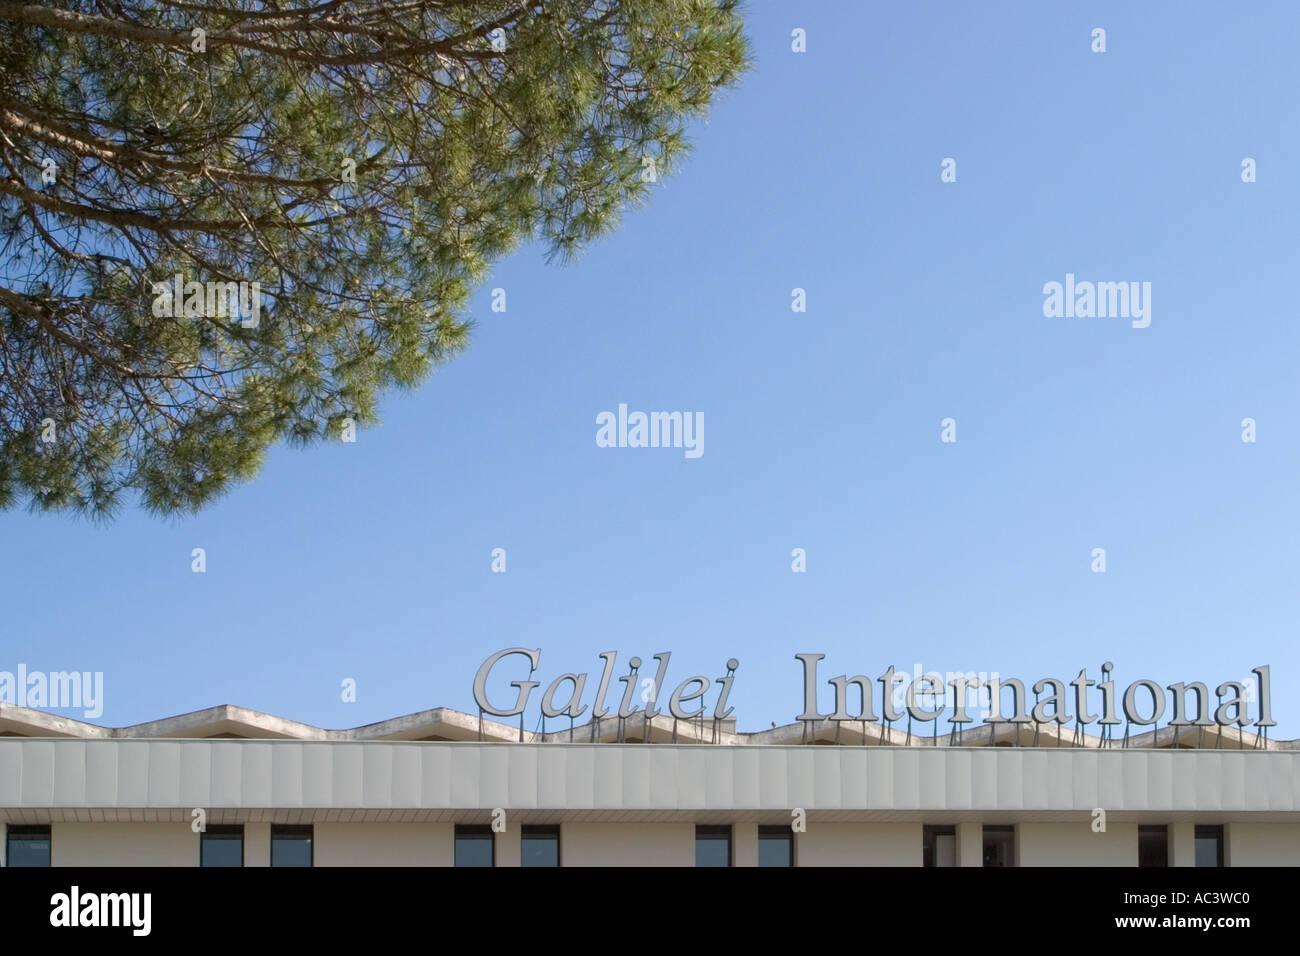 Aeroporto Pisa : Fly parking pisa parcheggio aeroporto pisa prenota subito il